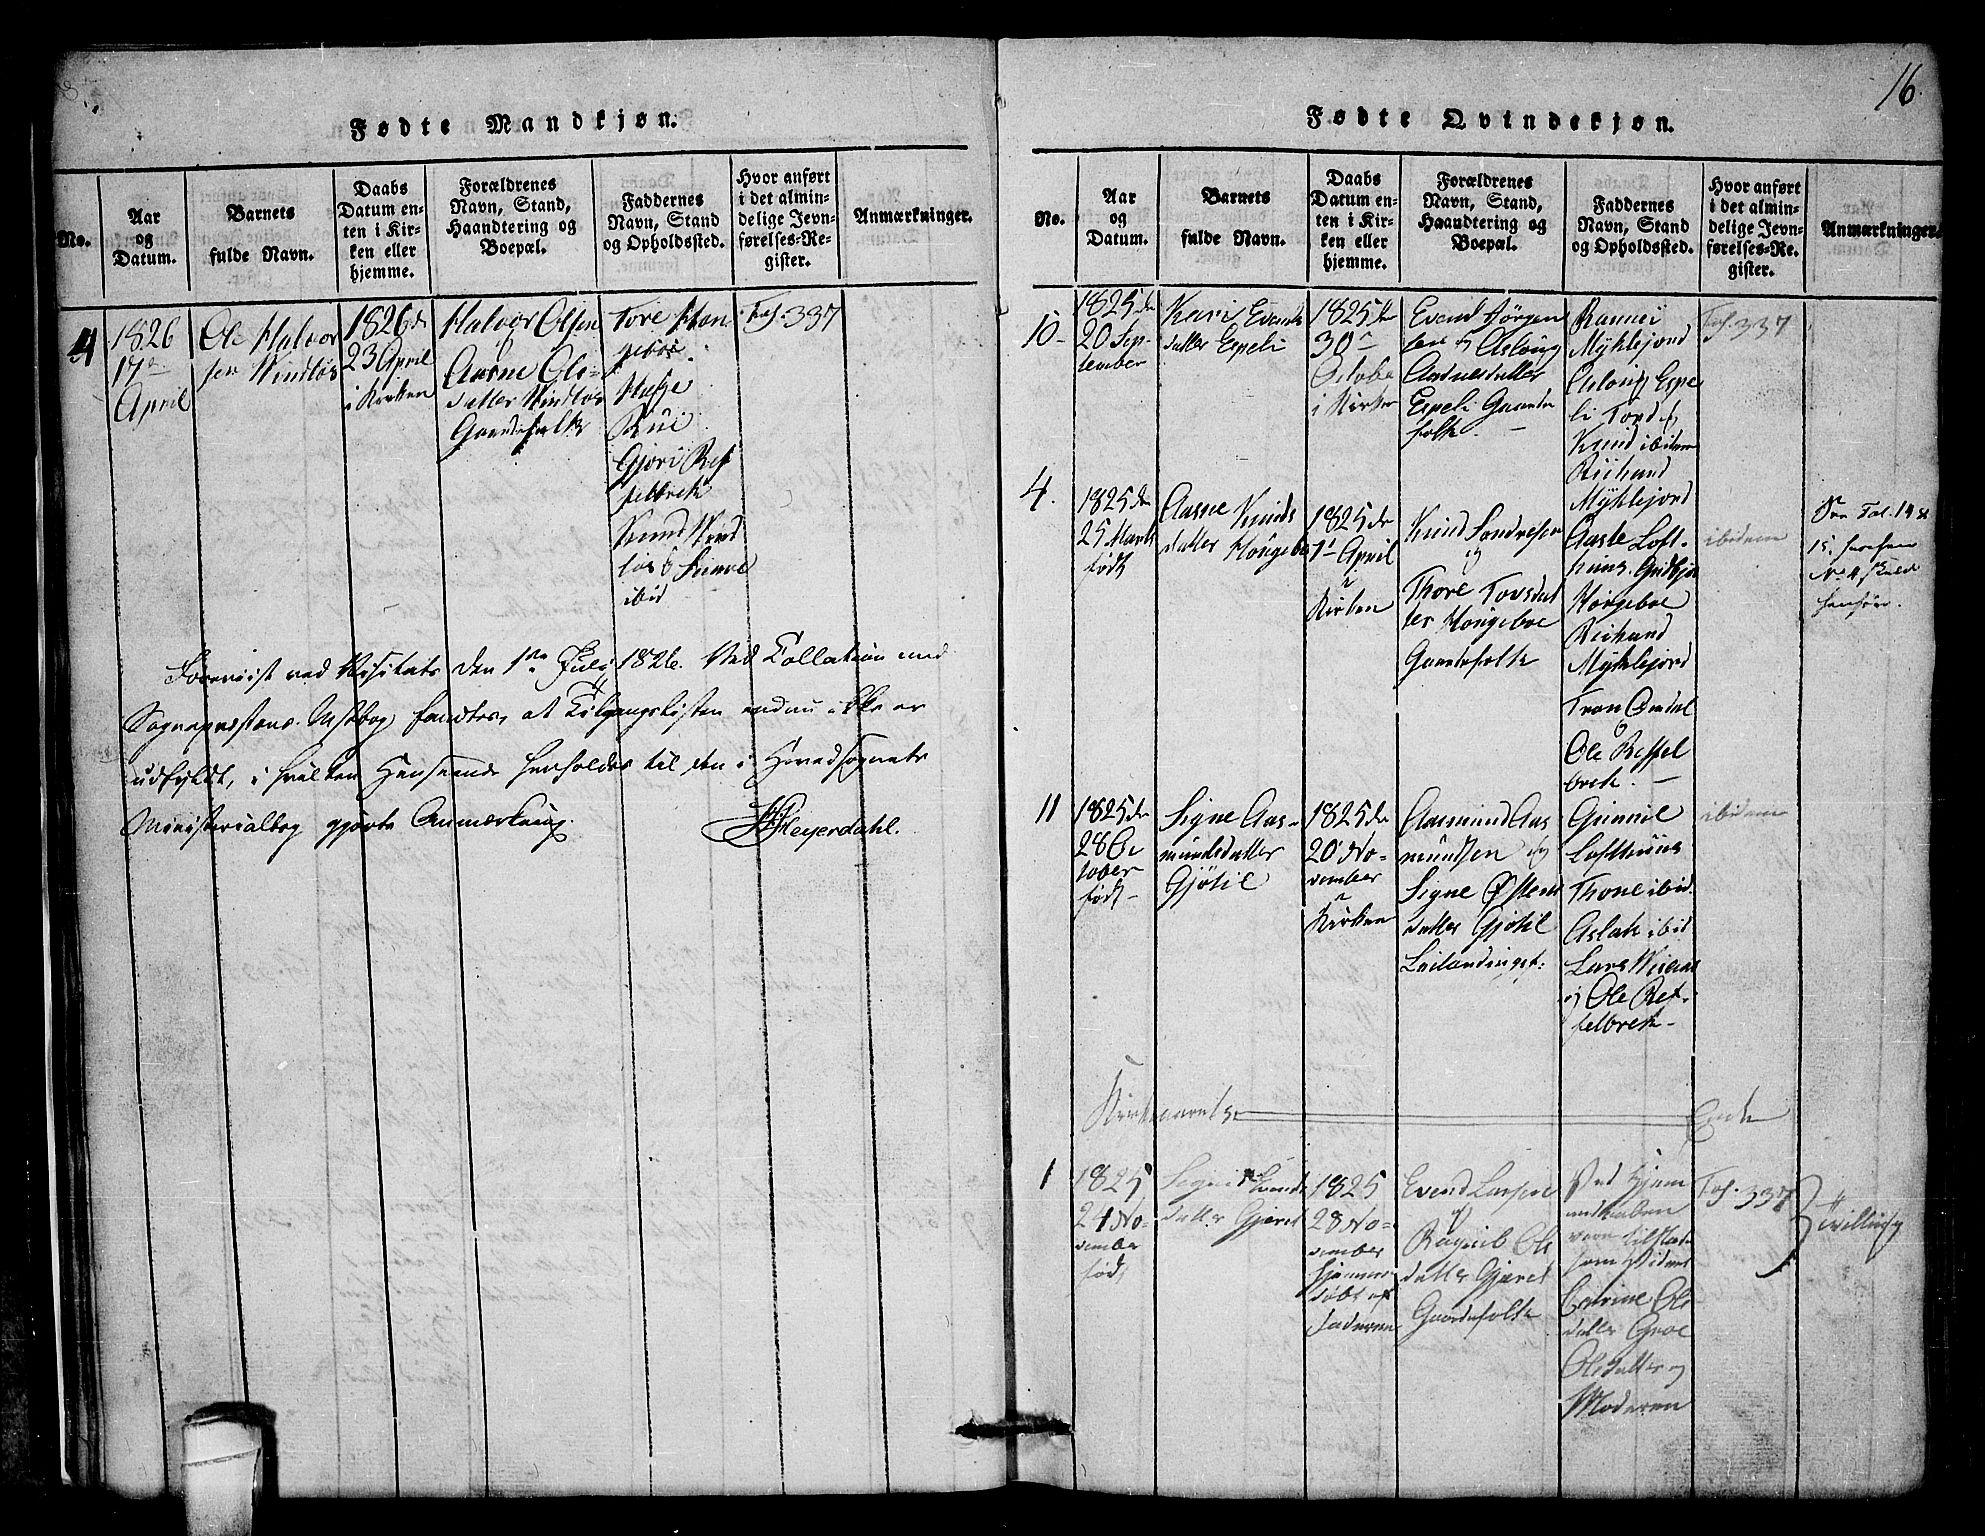 SAKO, Lårdal kirkebøker, G/Gb/L0001: Klokkerbok nr. II 1, 1815-1865, s. 16